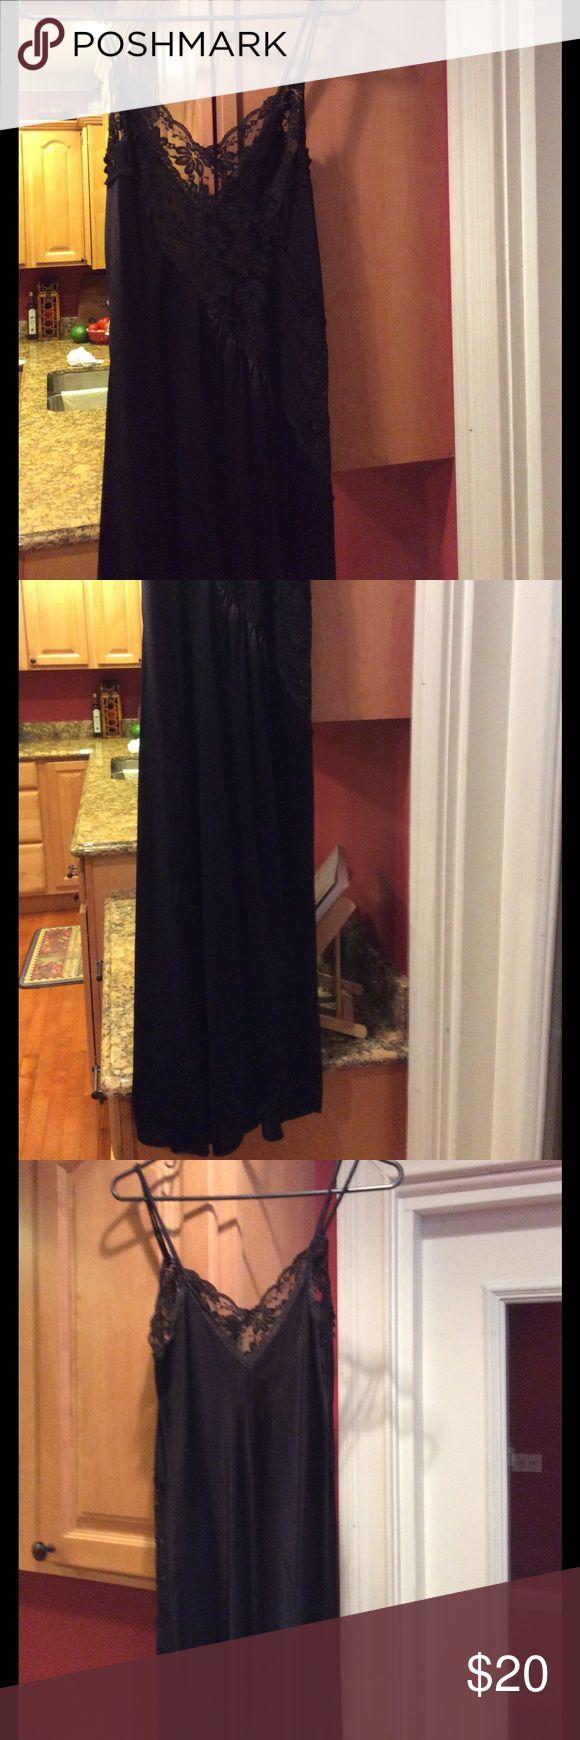 Vintage Val Mode Lingerie Vintage black negligee w/lace Val Mode Intimates & Sleepwear Chemises & Slips